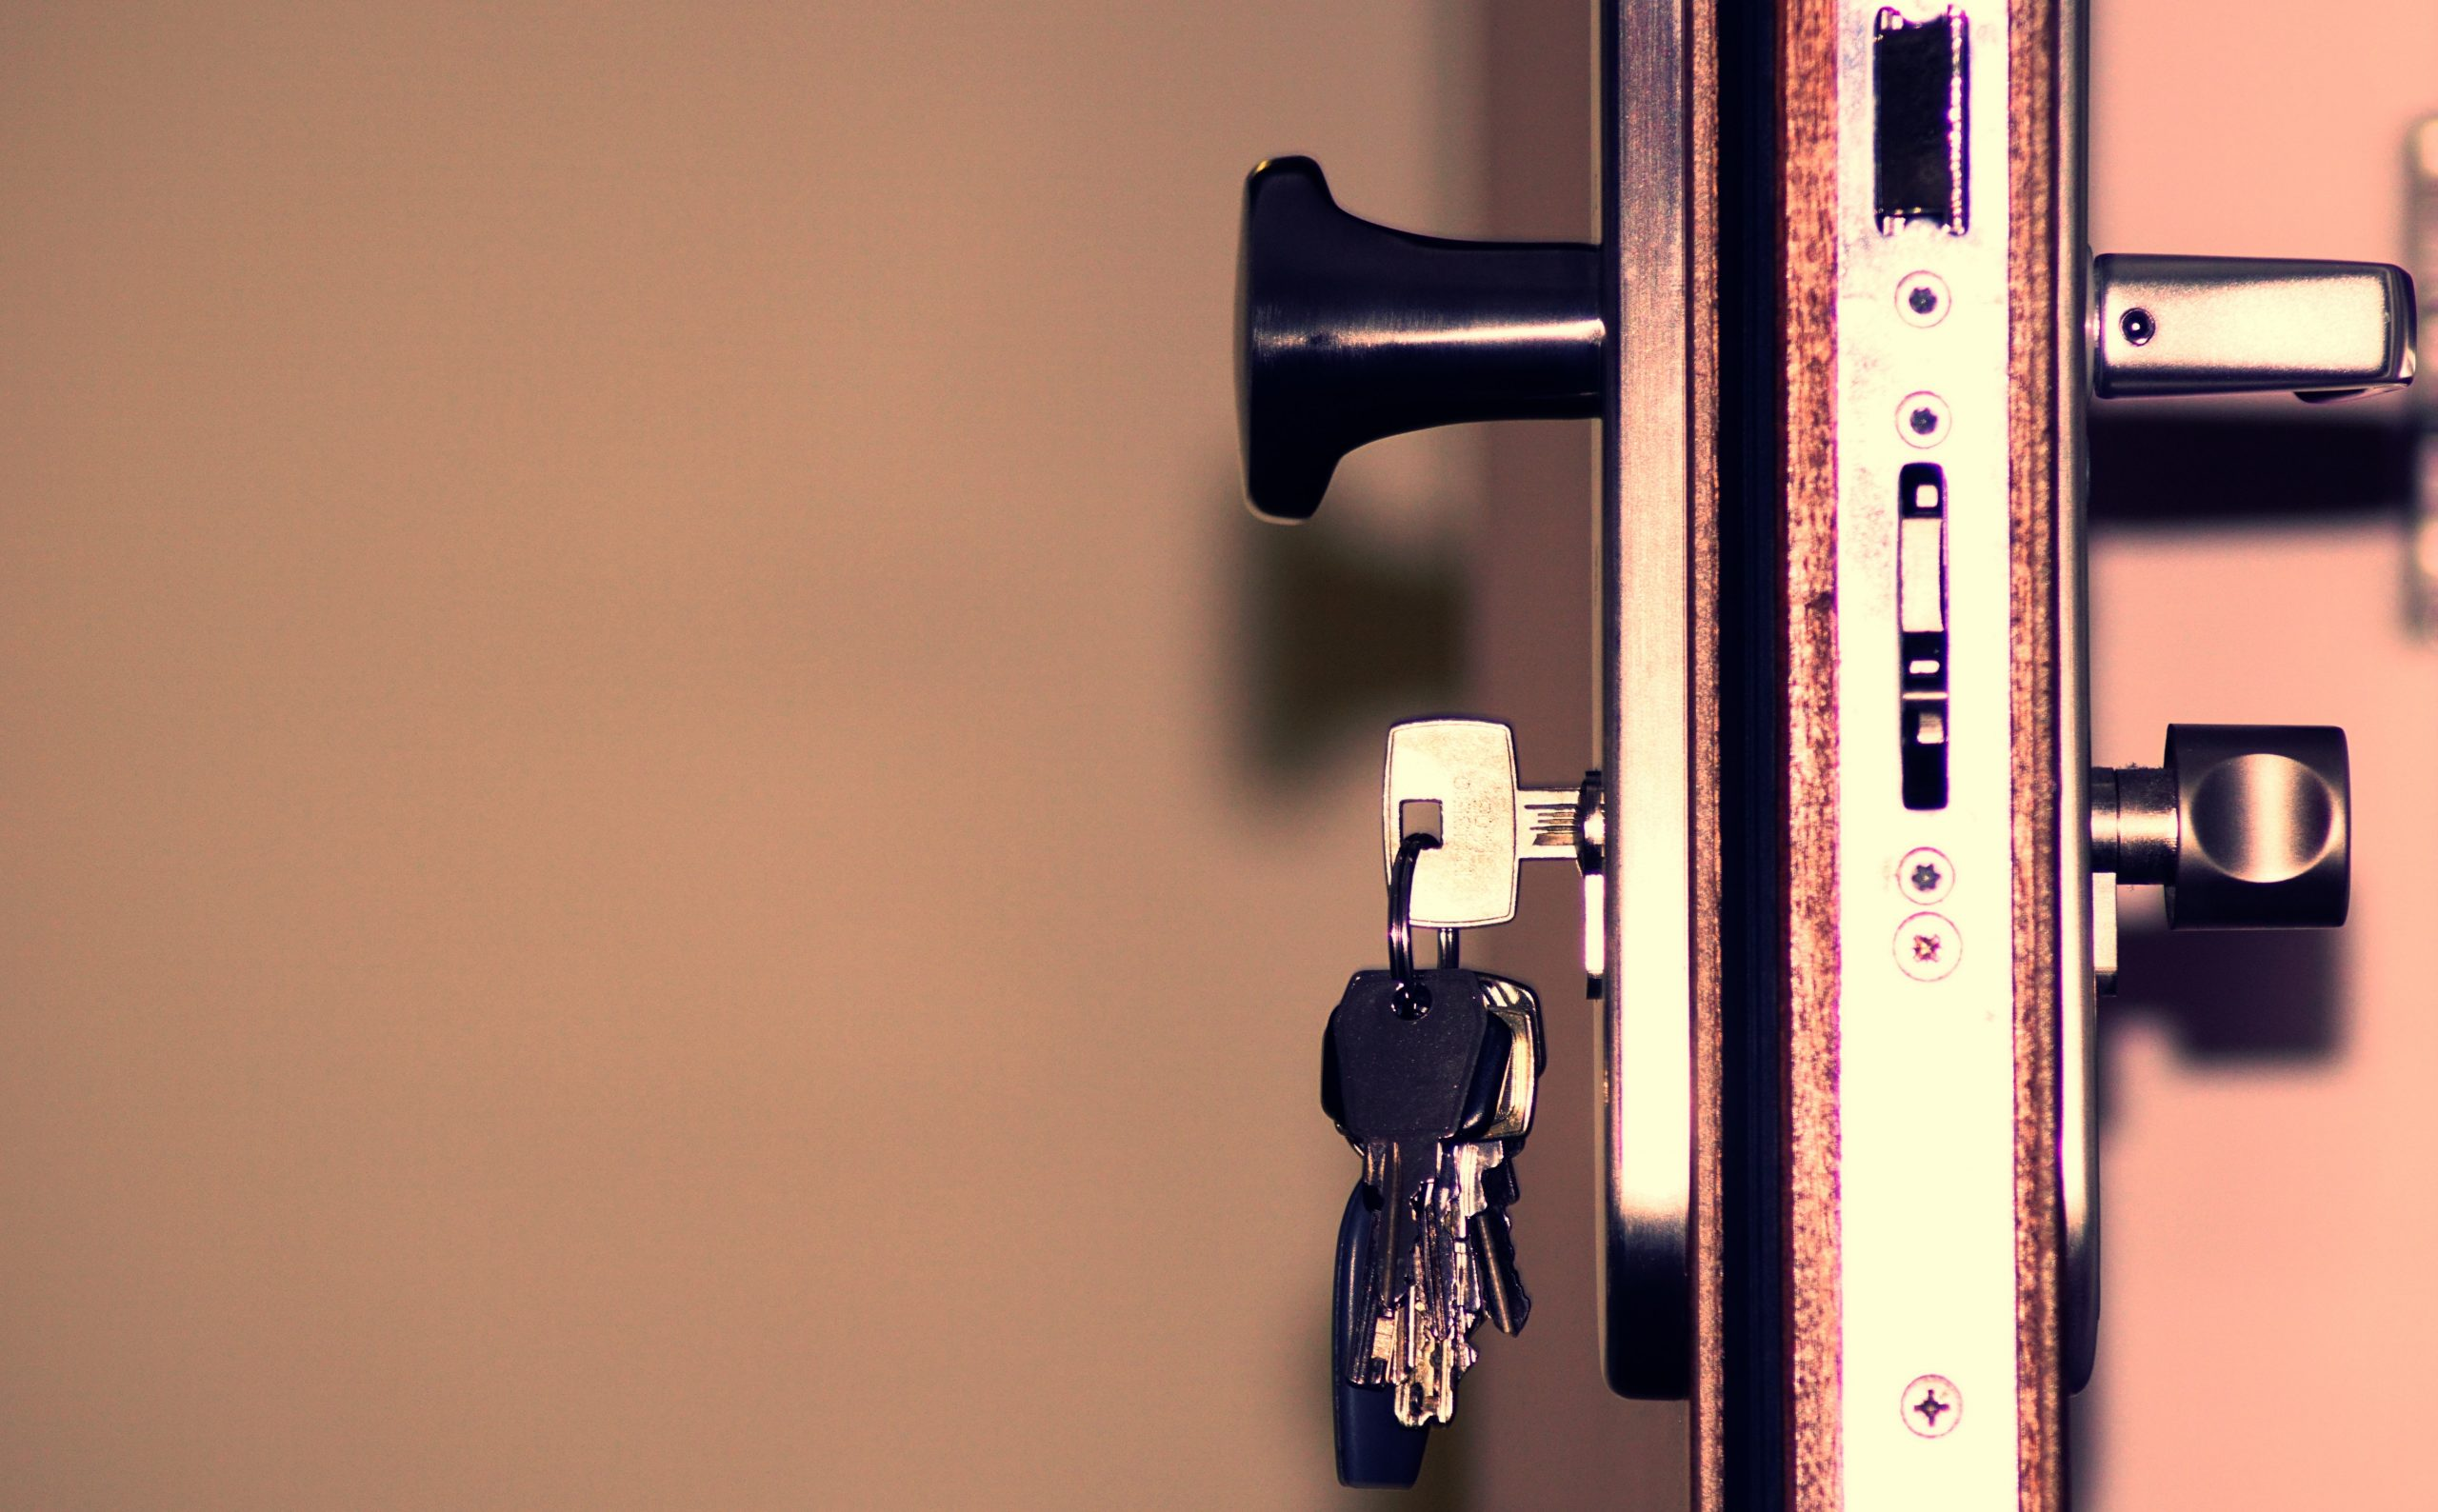 black-and-grey-keys-792034